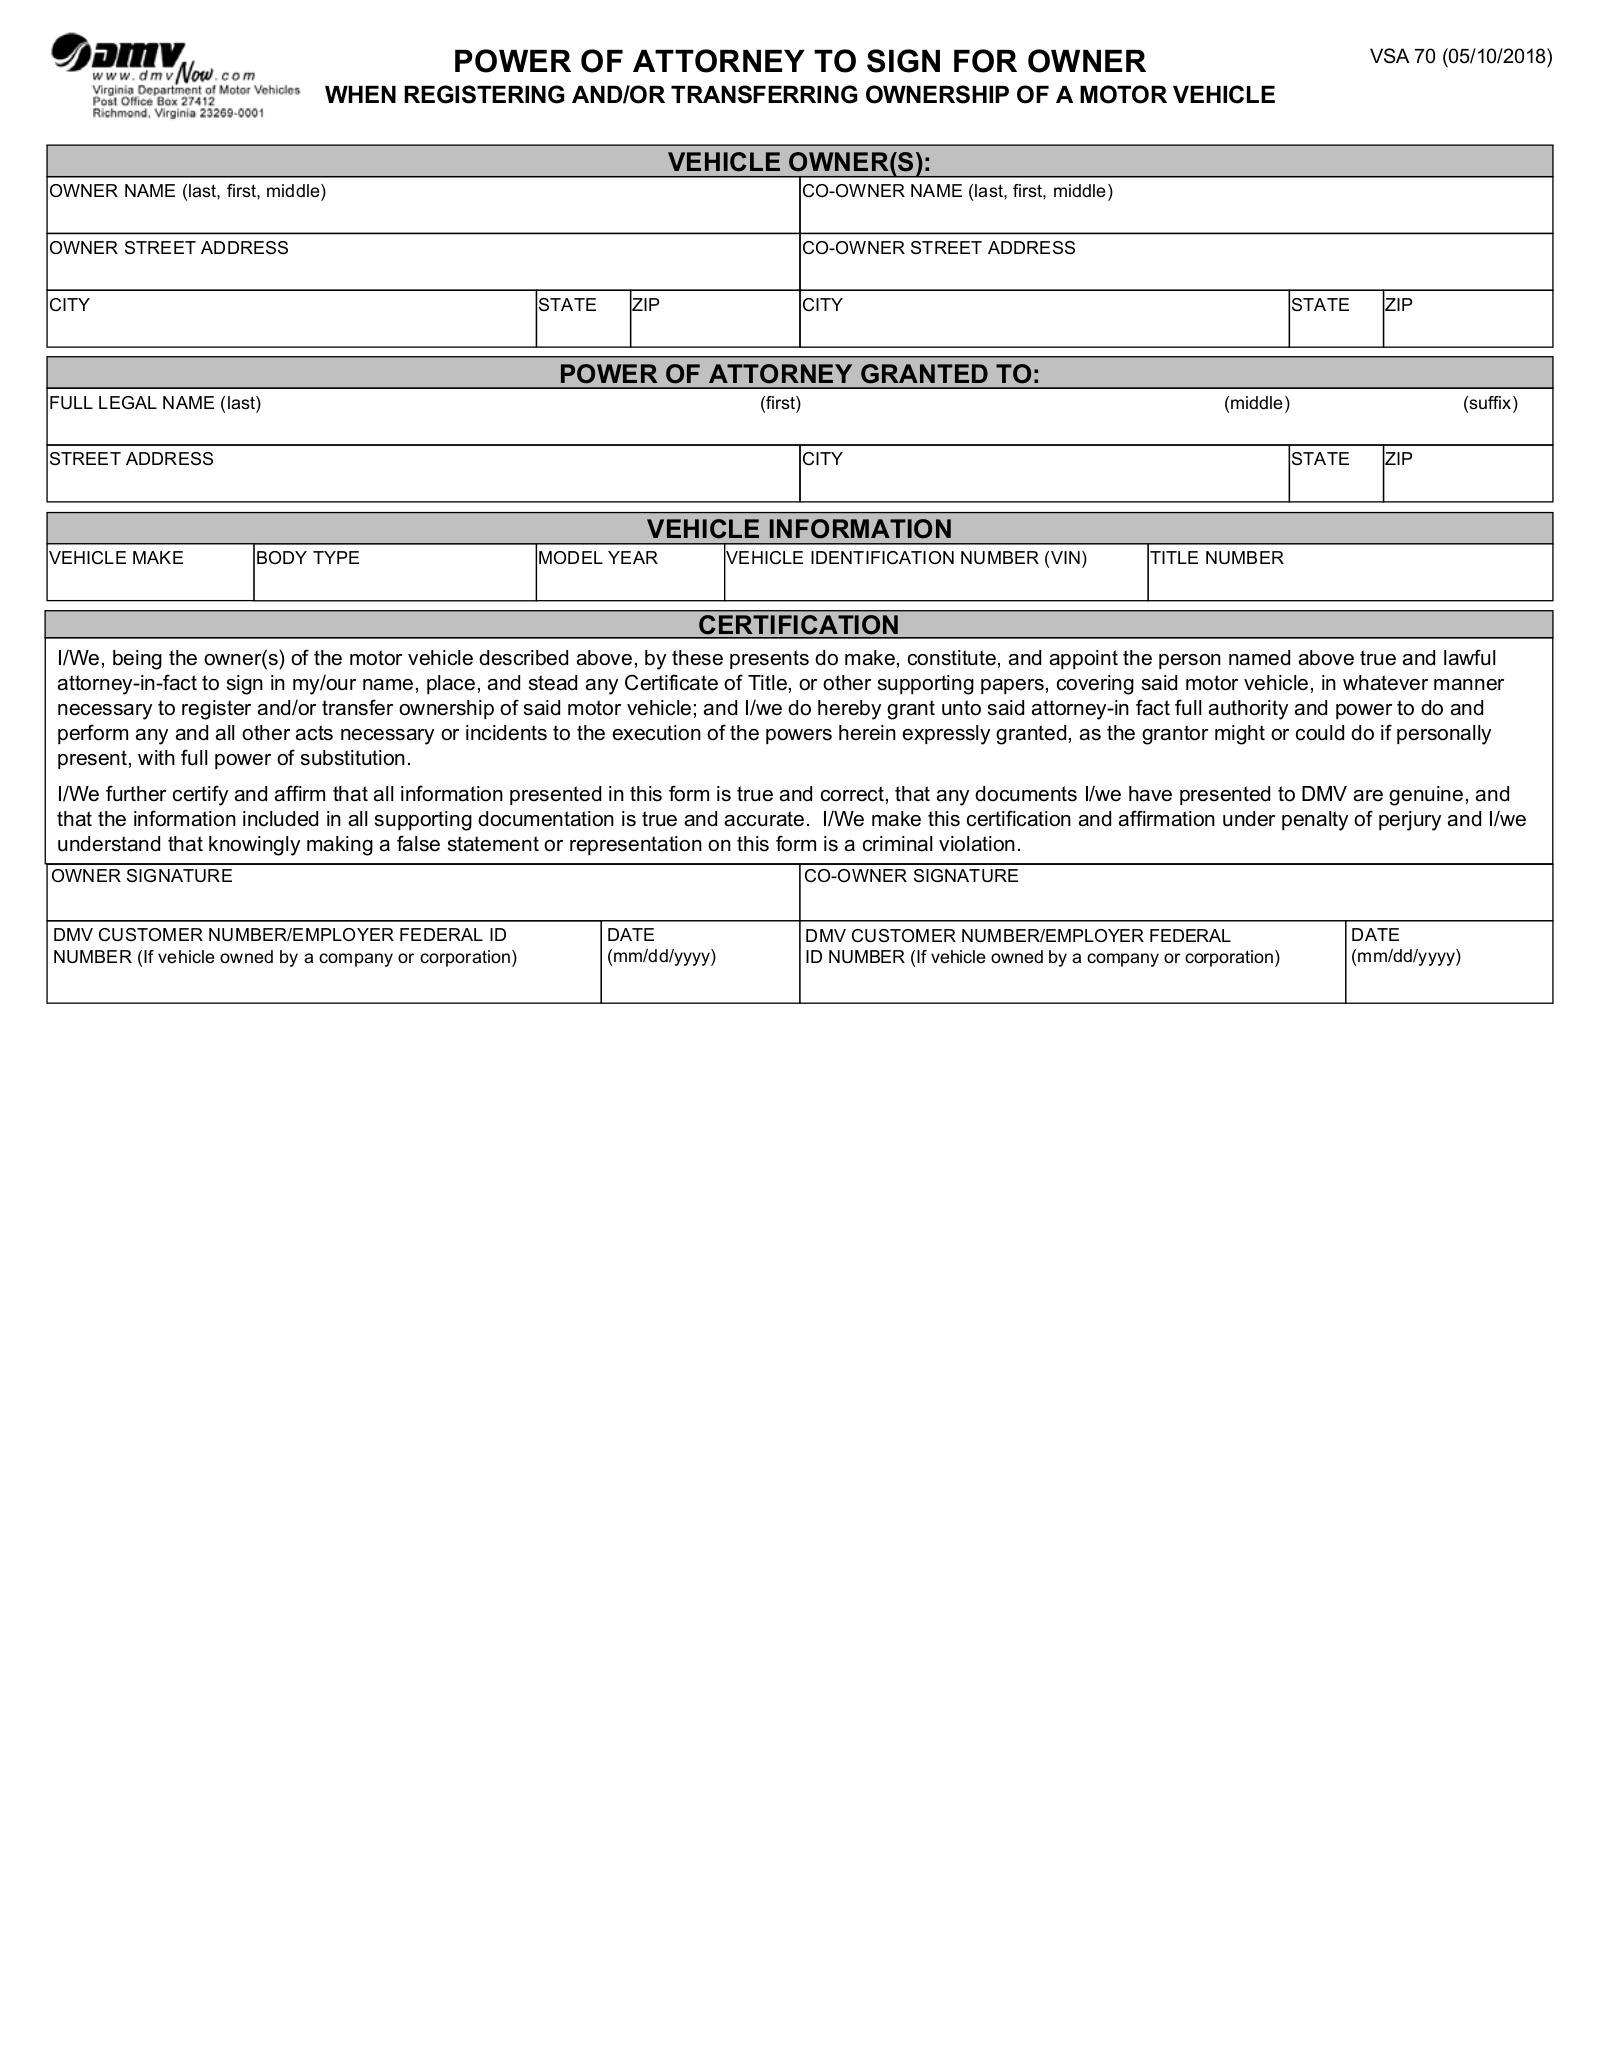 Virginia Motor Vehicle Power Of Attorney Form VSA 70